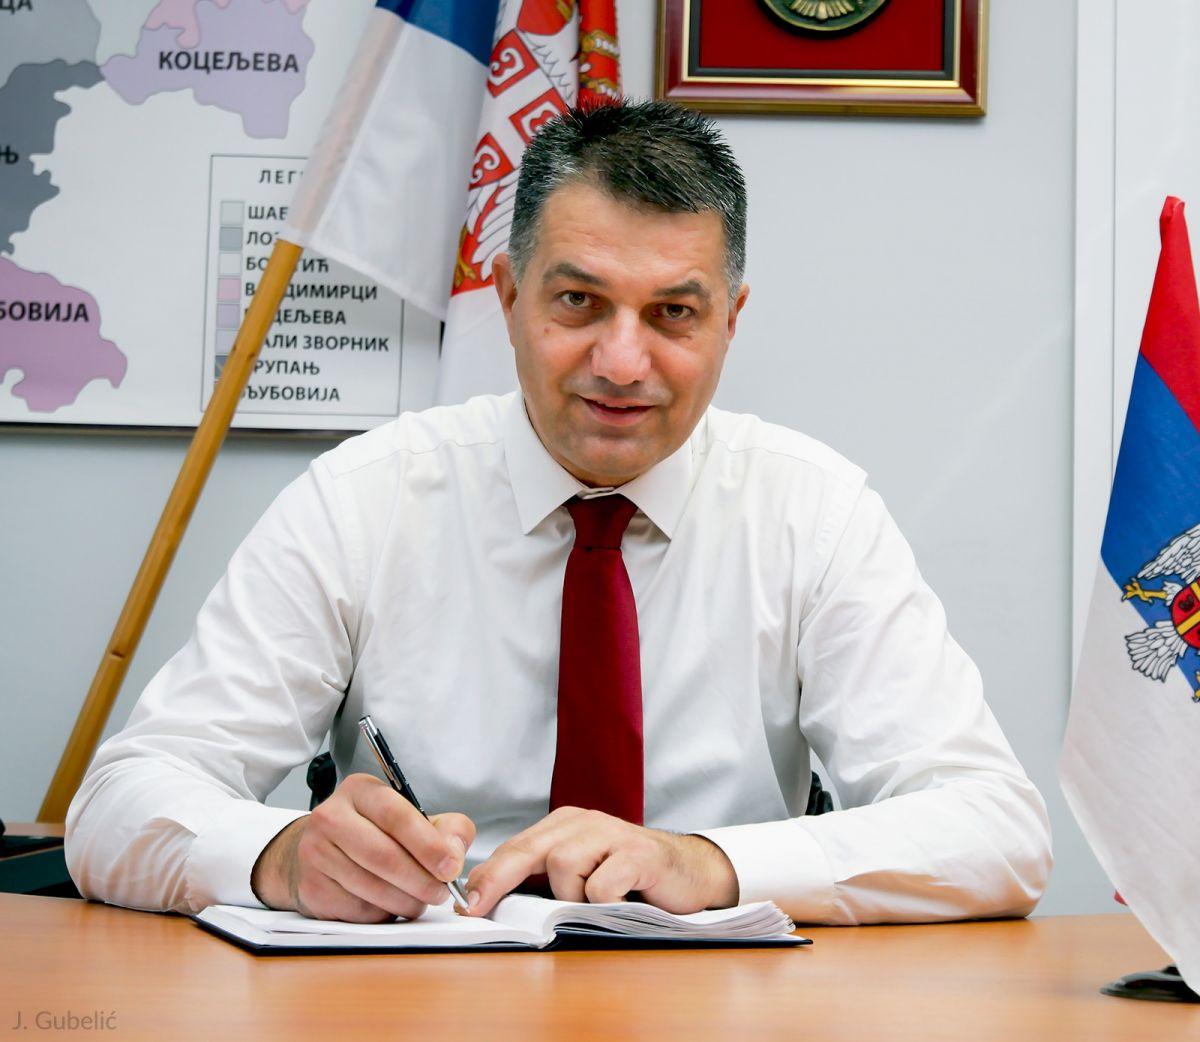 Načelnik MUO, Vladan Krasavac